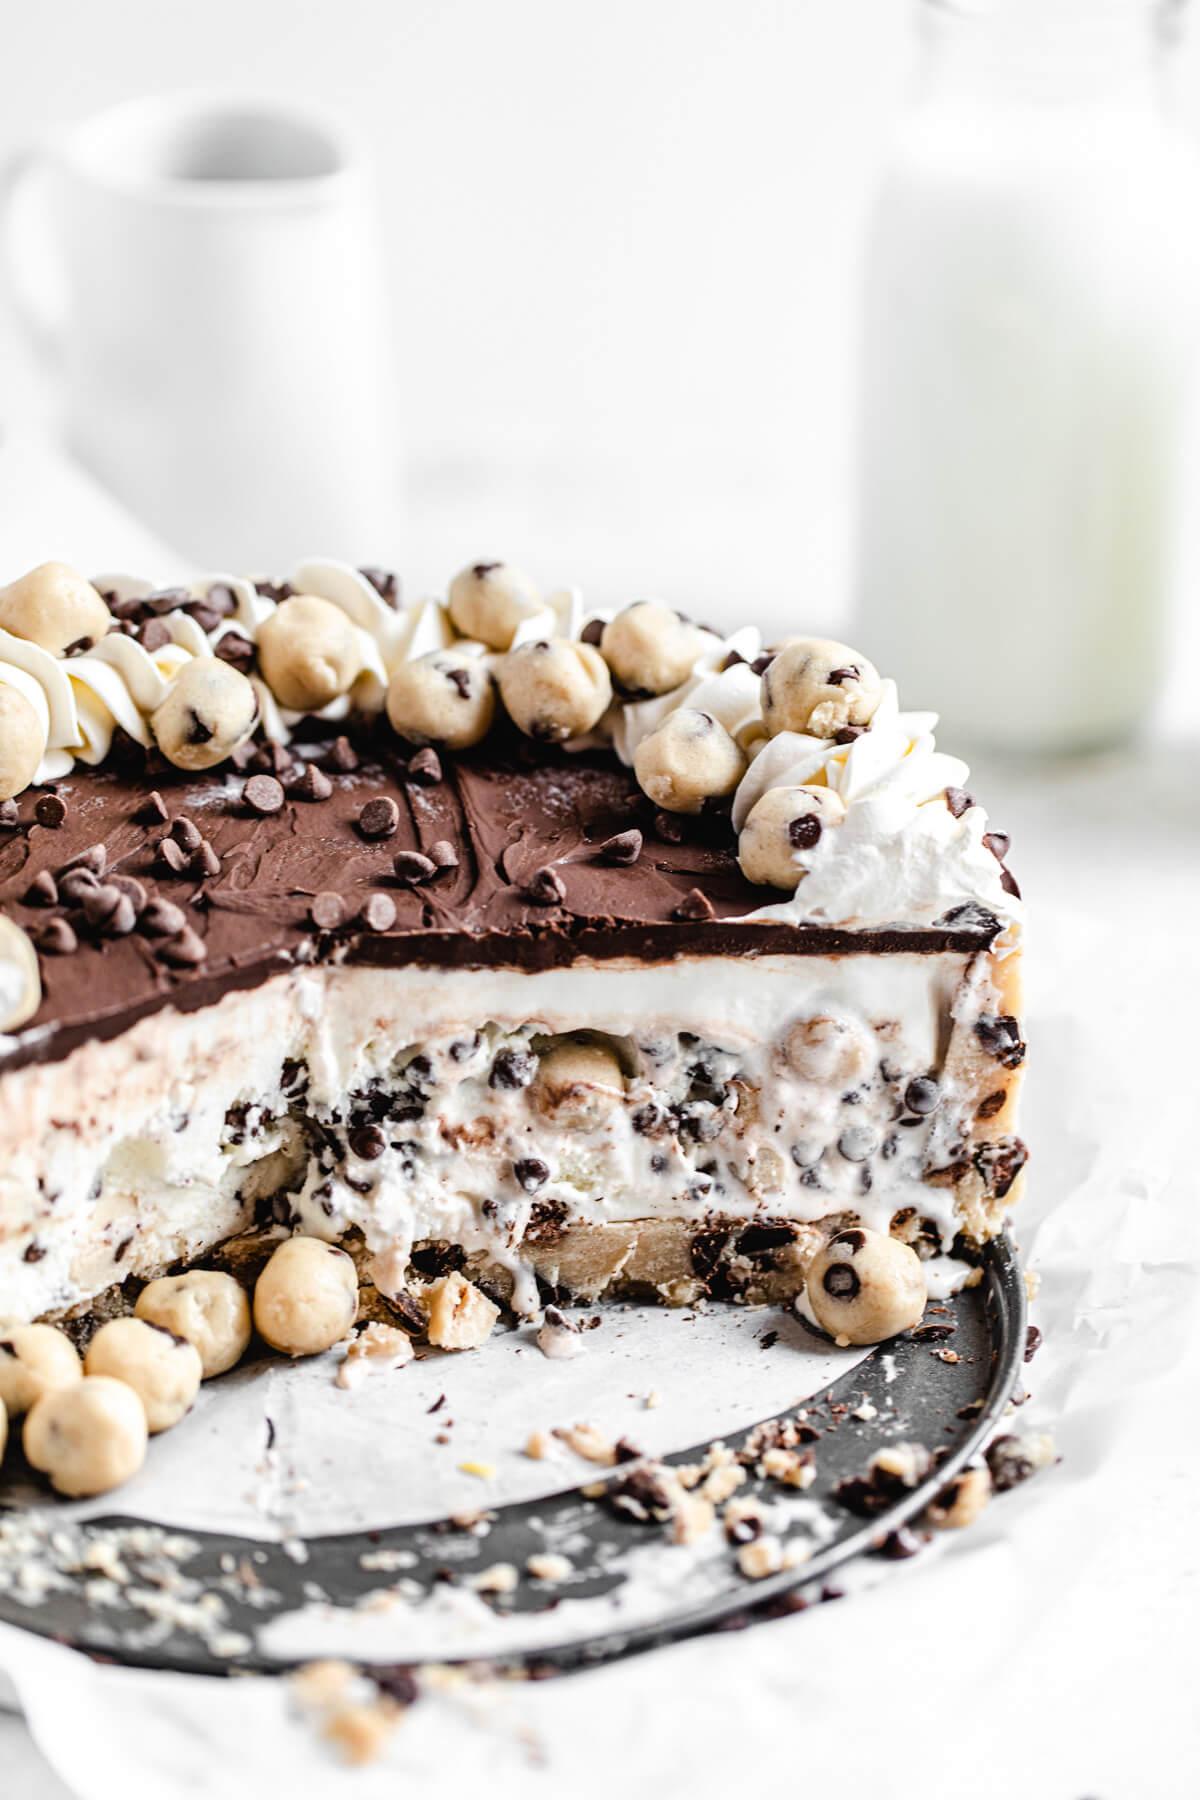 sliced ice cream cake on a platter